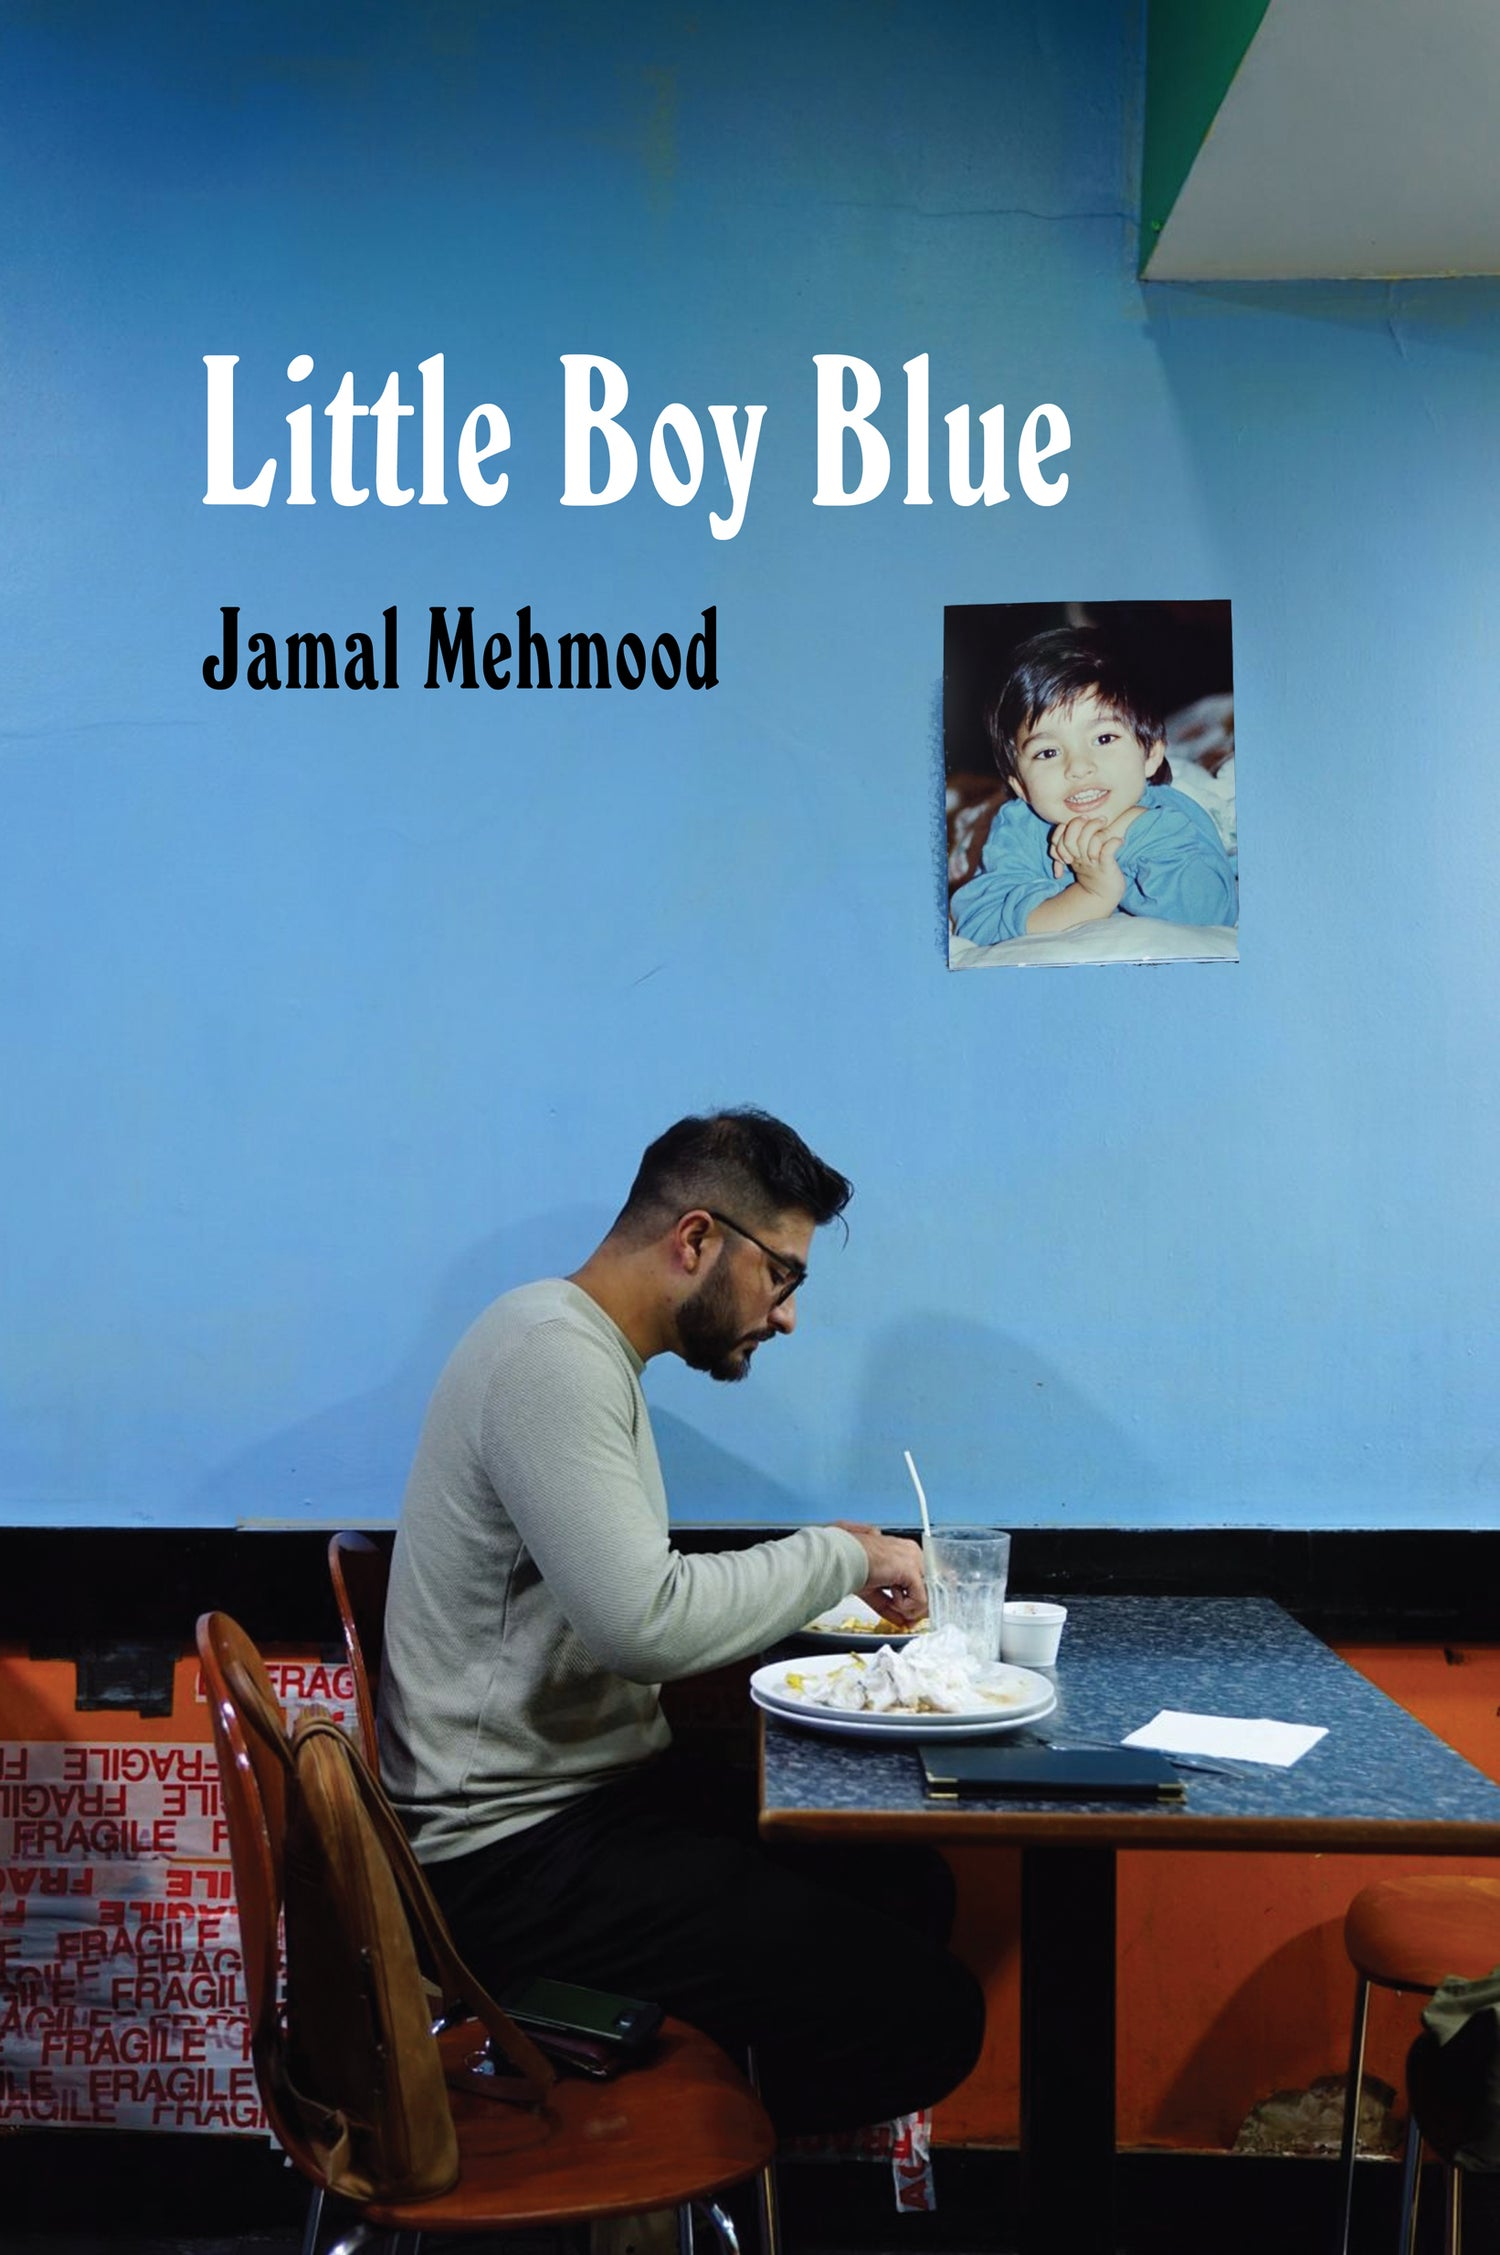 Image of Little Boy Blue by Jamal Mehmood